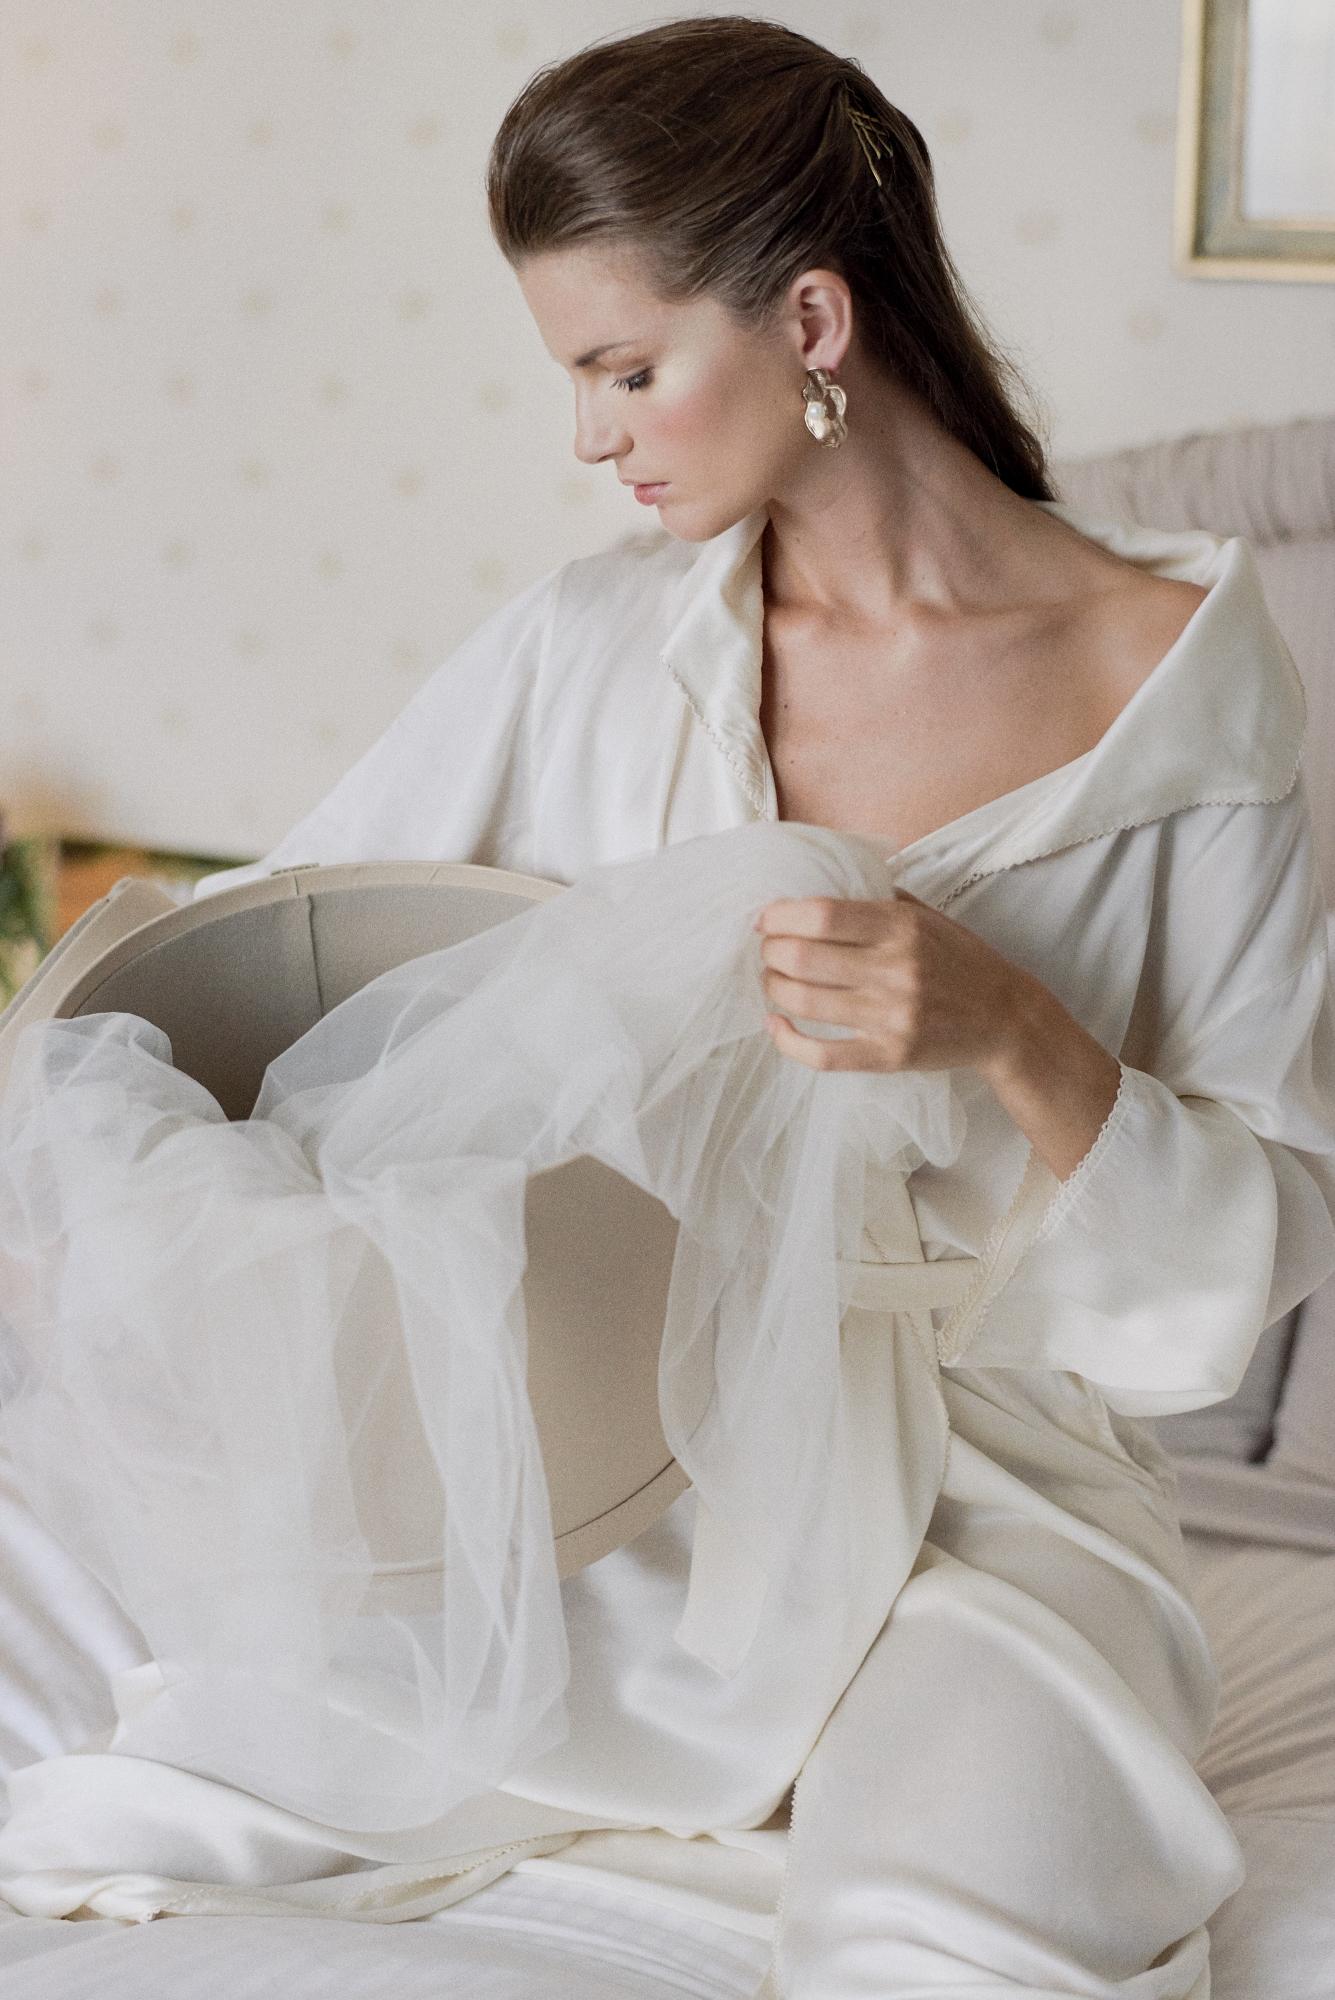 Sephory Photography-Her Morning Elegance Print 029 (1335x2000)